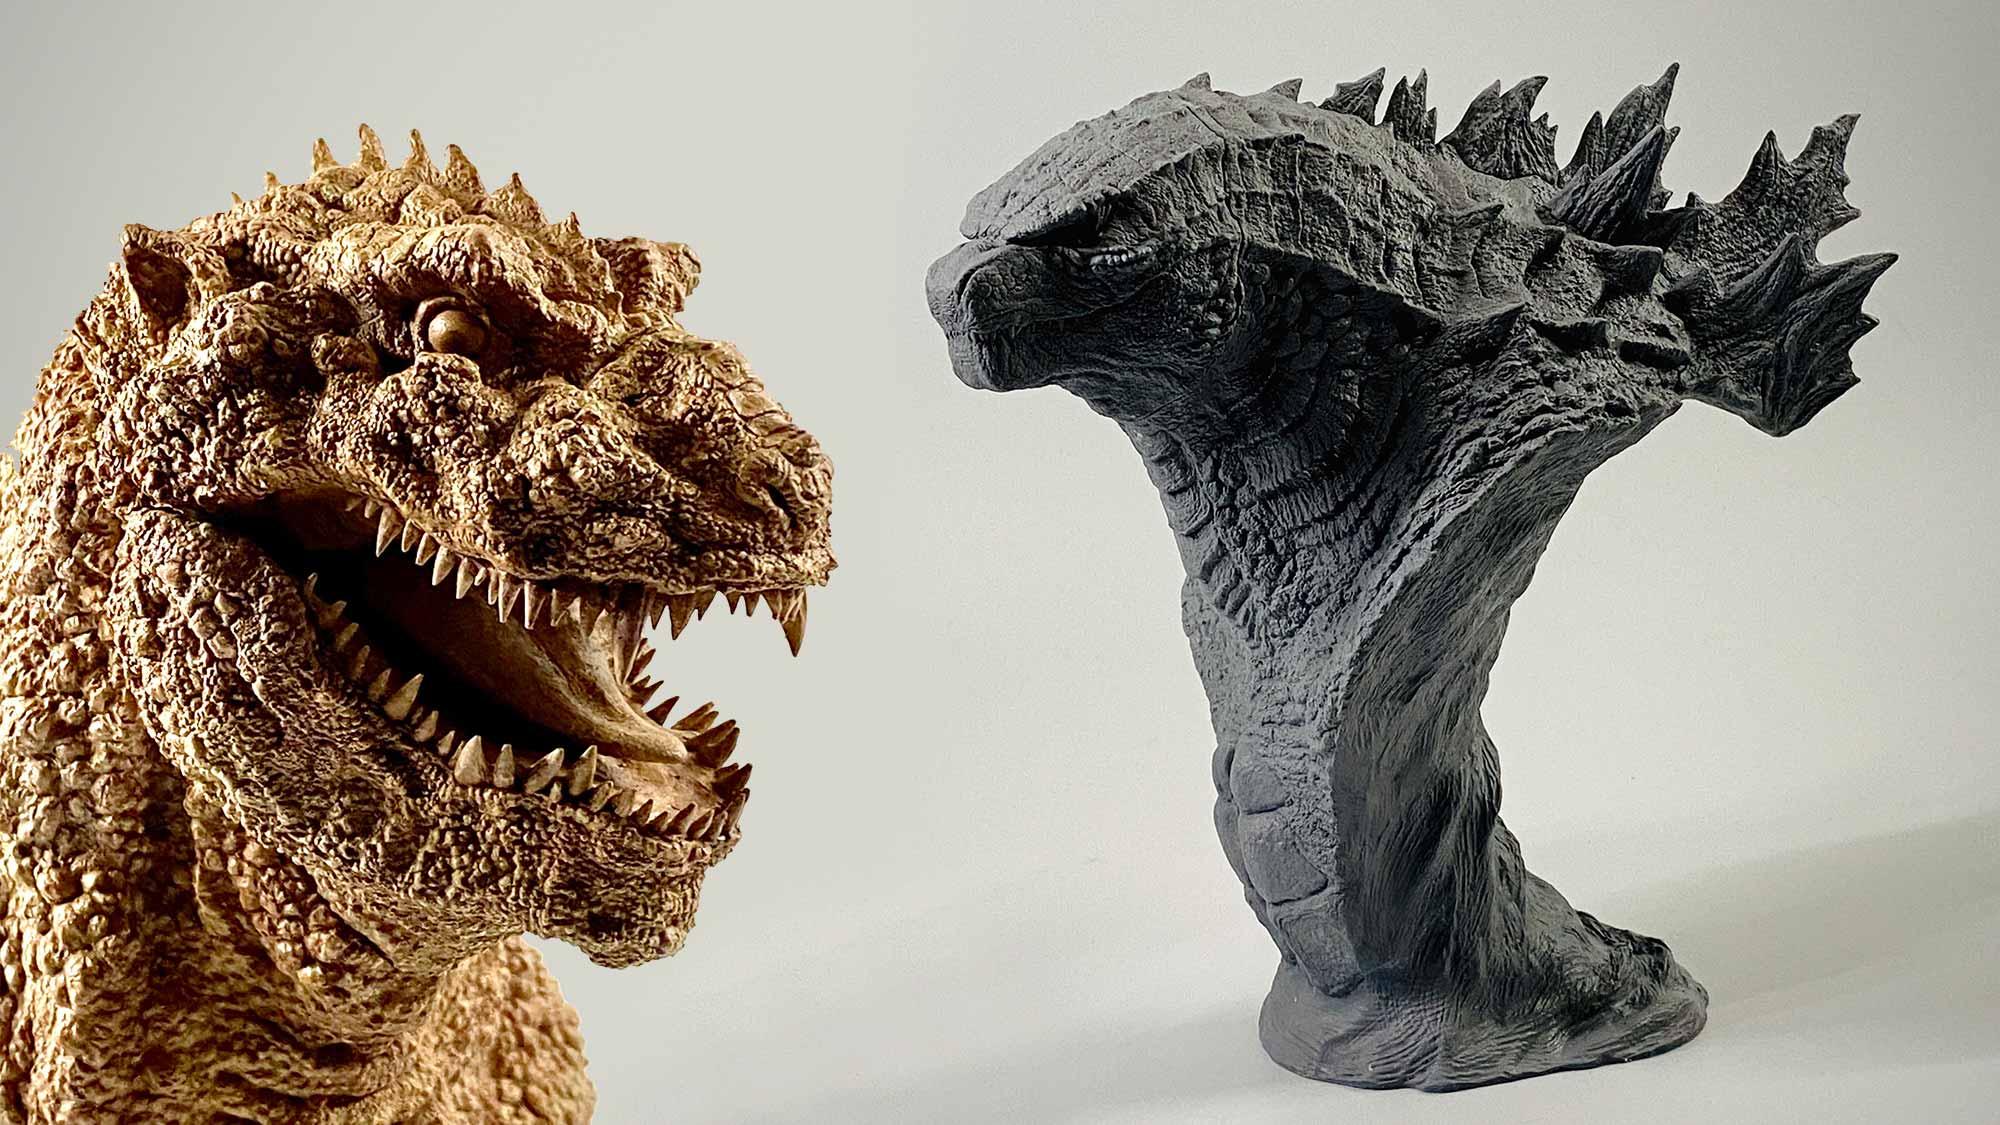 1954 And 2019 Godzilla Busts In Kit Form By Ken Ichi Tanaka Of Tanaka Studio Shouts